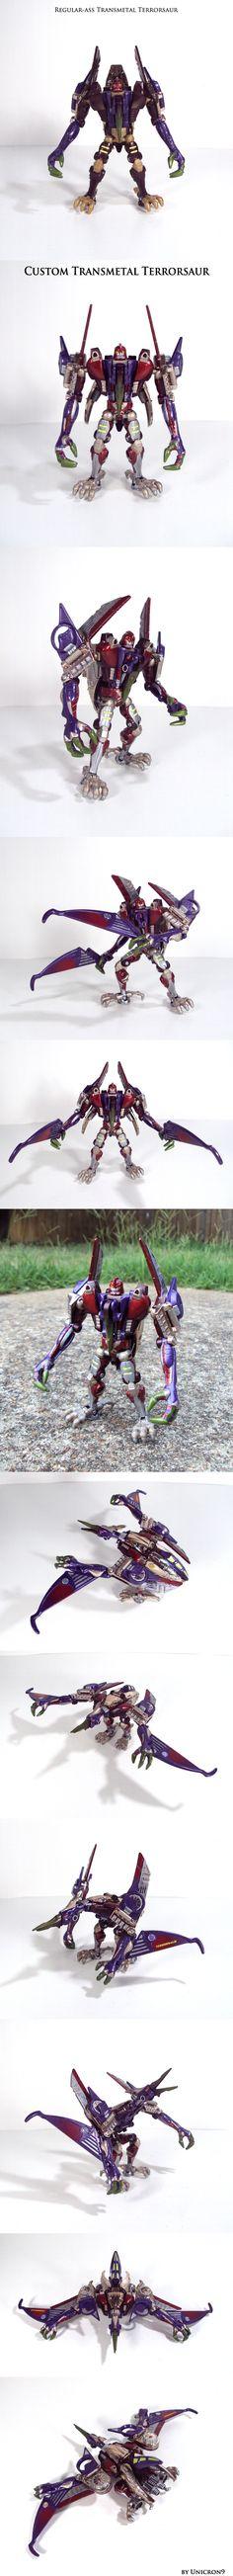 Transmetal Terrorsaur by Unicron9 on DeviantArt